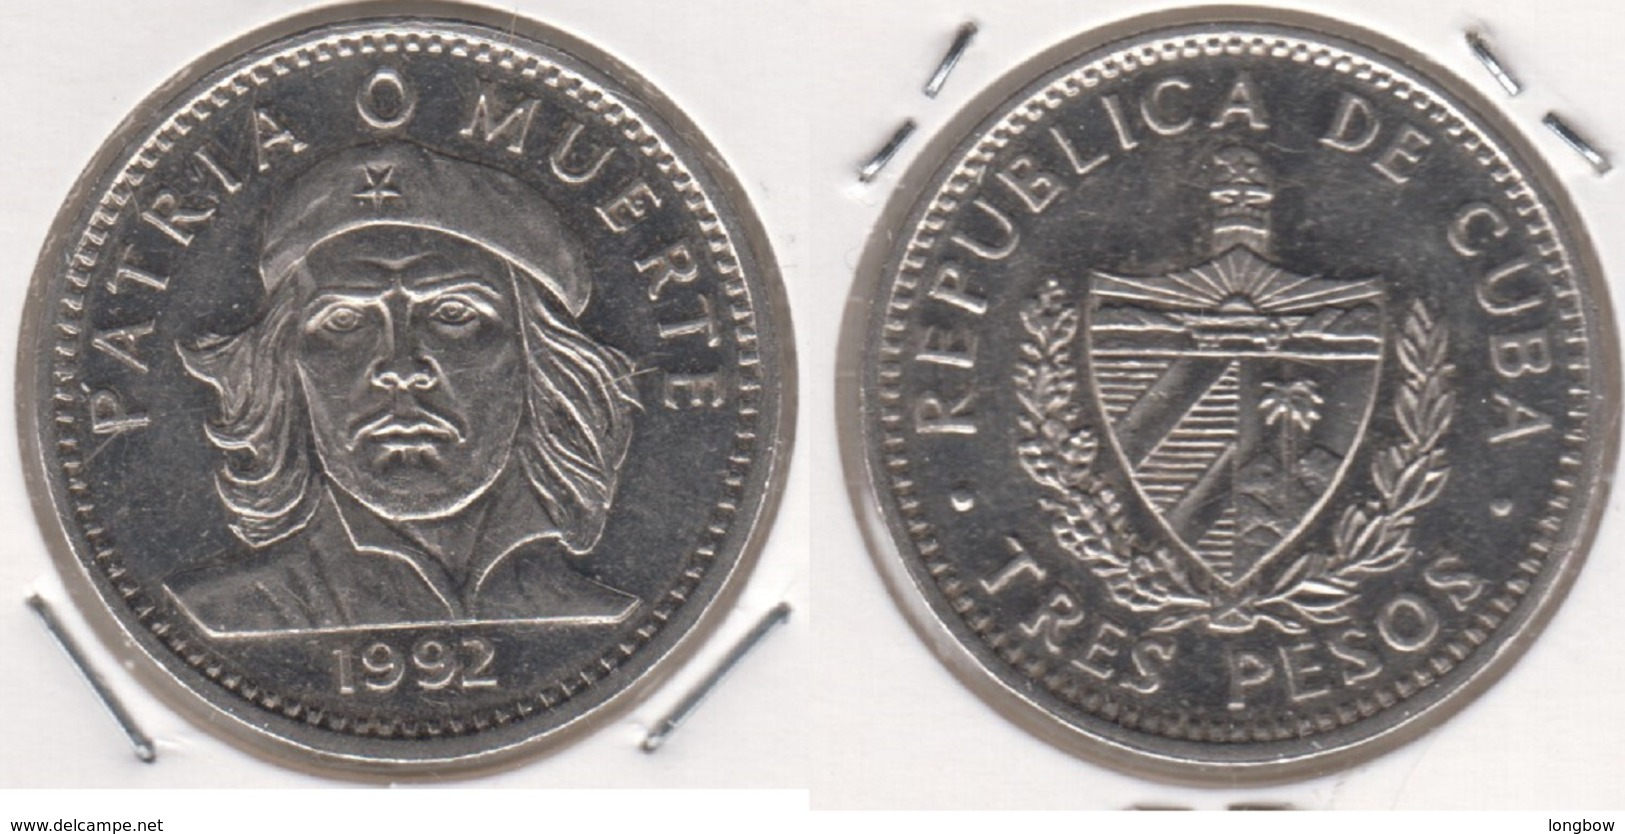 Cuba 3 Pesos 1992 Ernesto Che Guevara KM#346a - Cuba